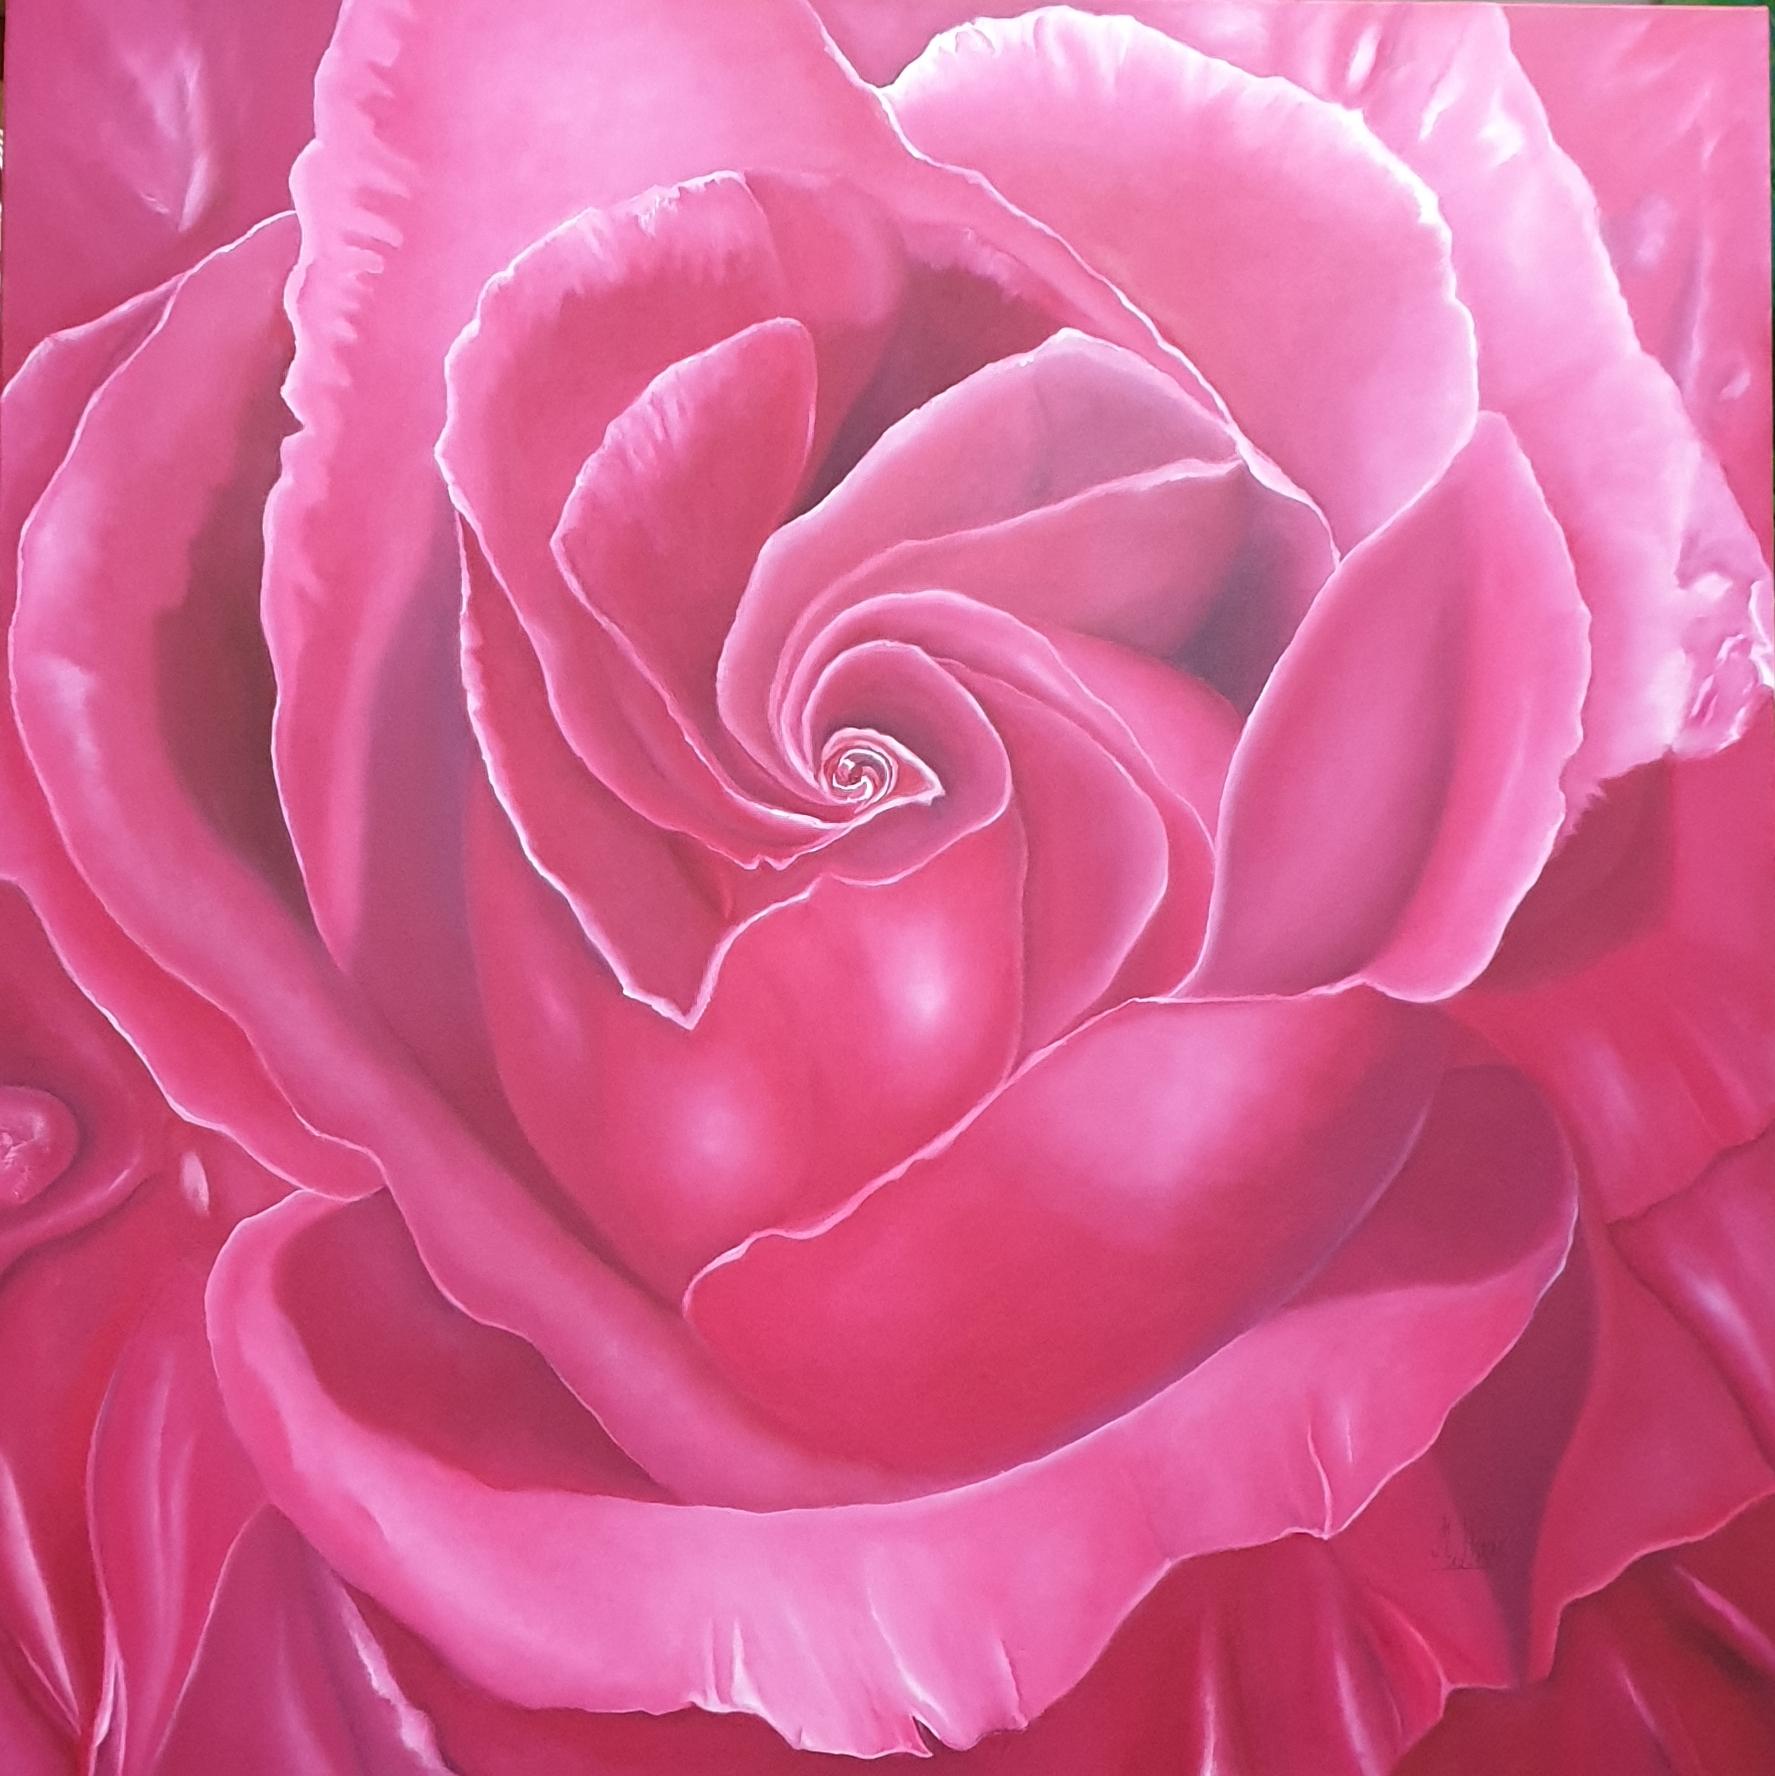 Pink-Rose-Rosenbild-100x100cm-Rheingau-Oelmalerei-MarionHaas-